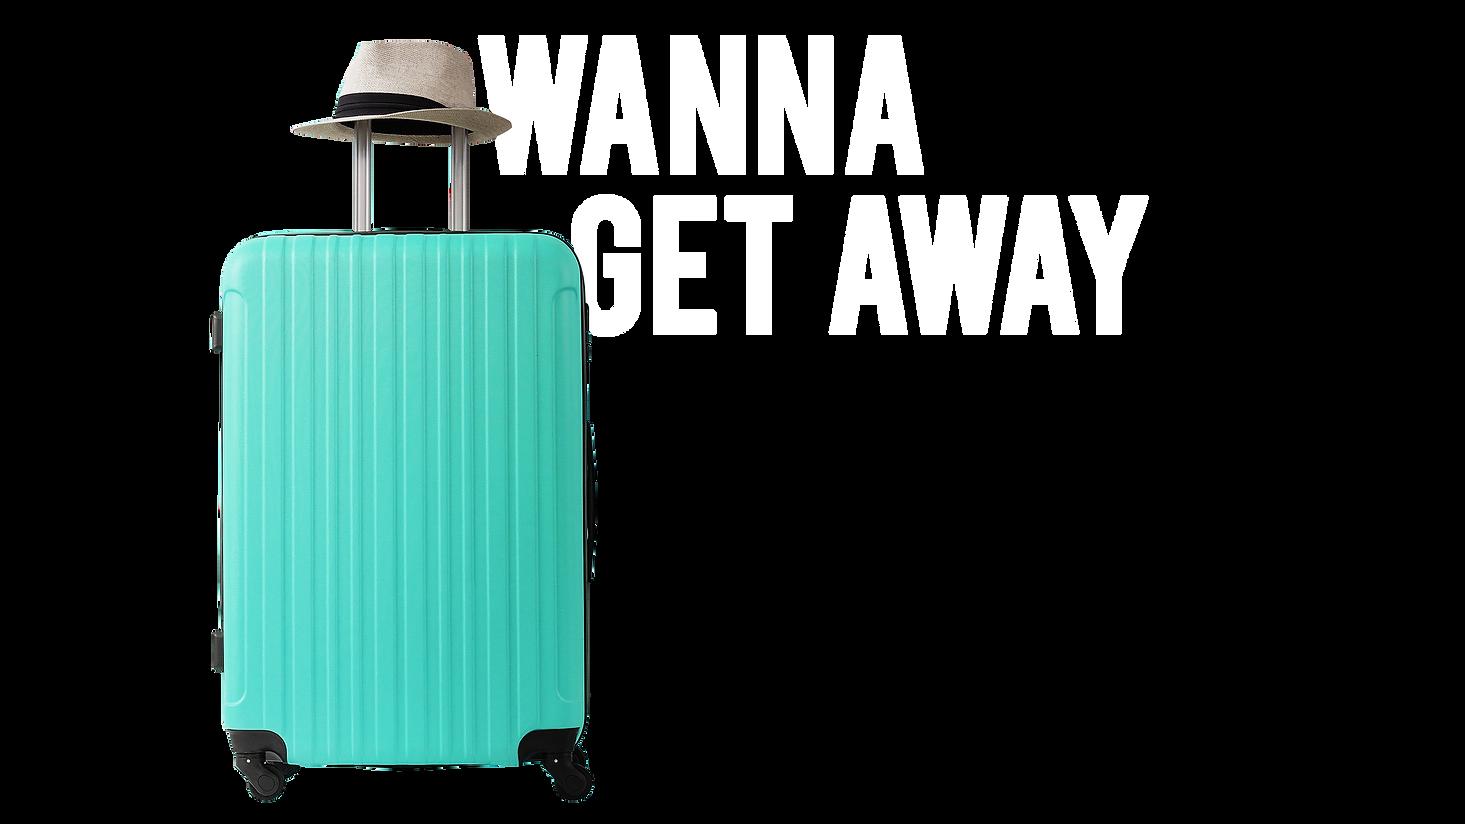 GetawayGiveaway_LandingPg_art.png